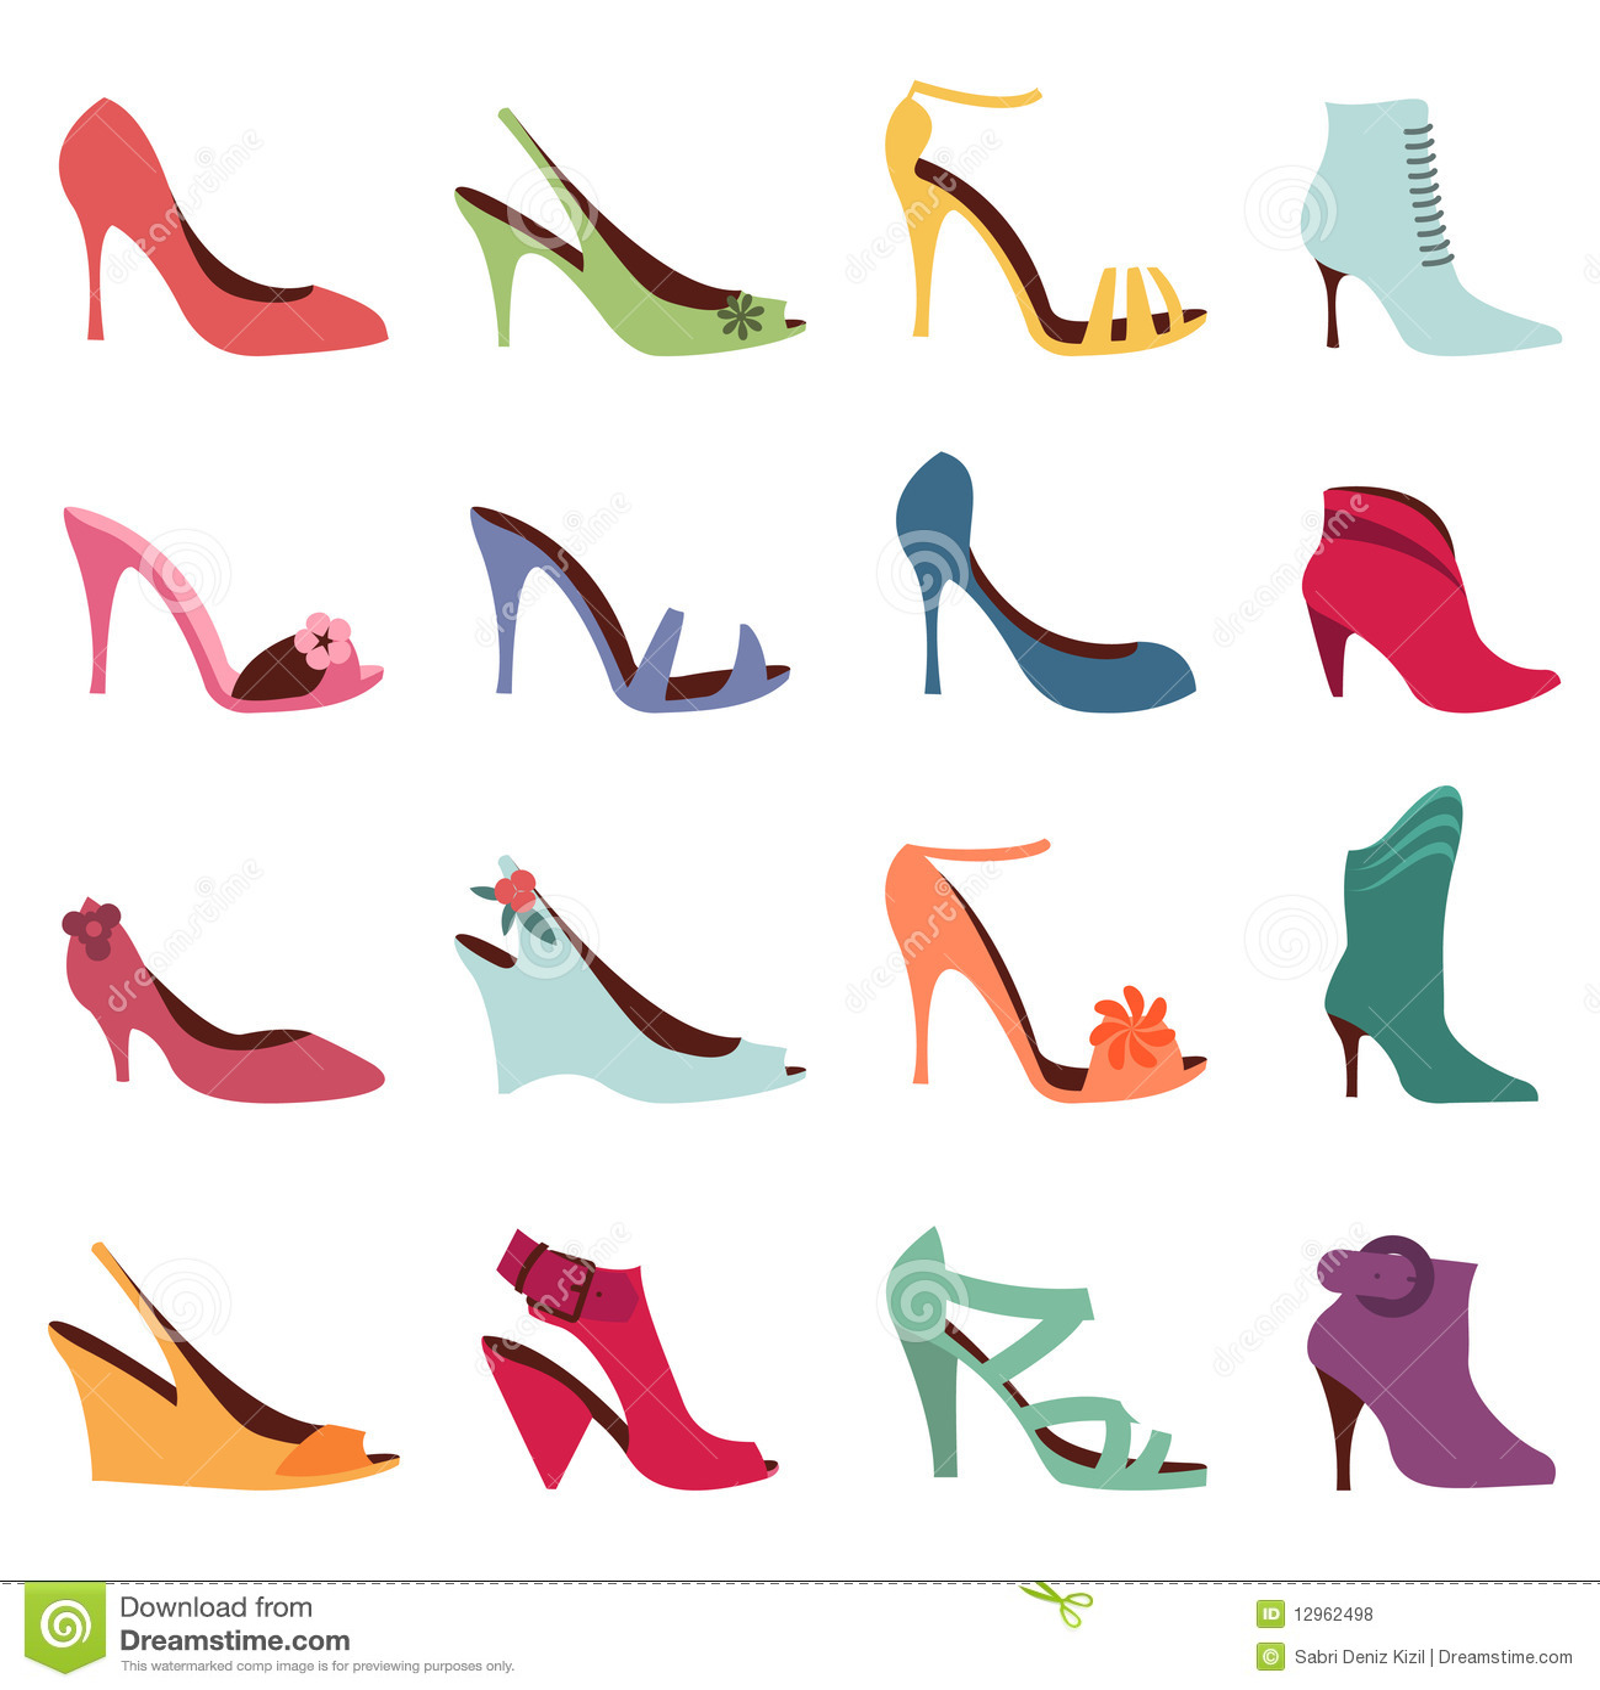 Royalty Free Stock Photos: Fashion women shoes